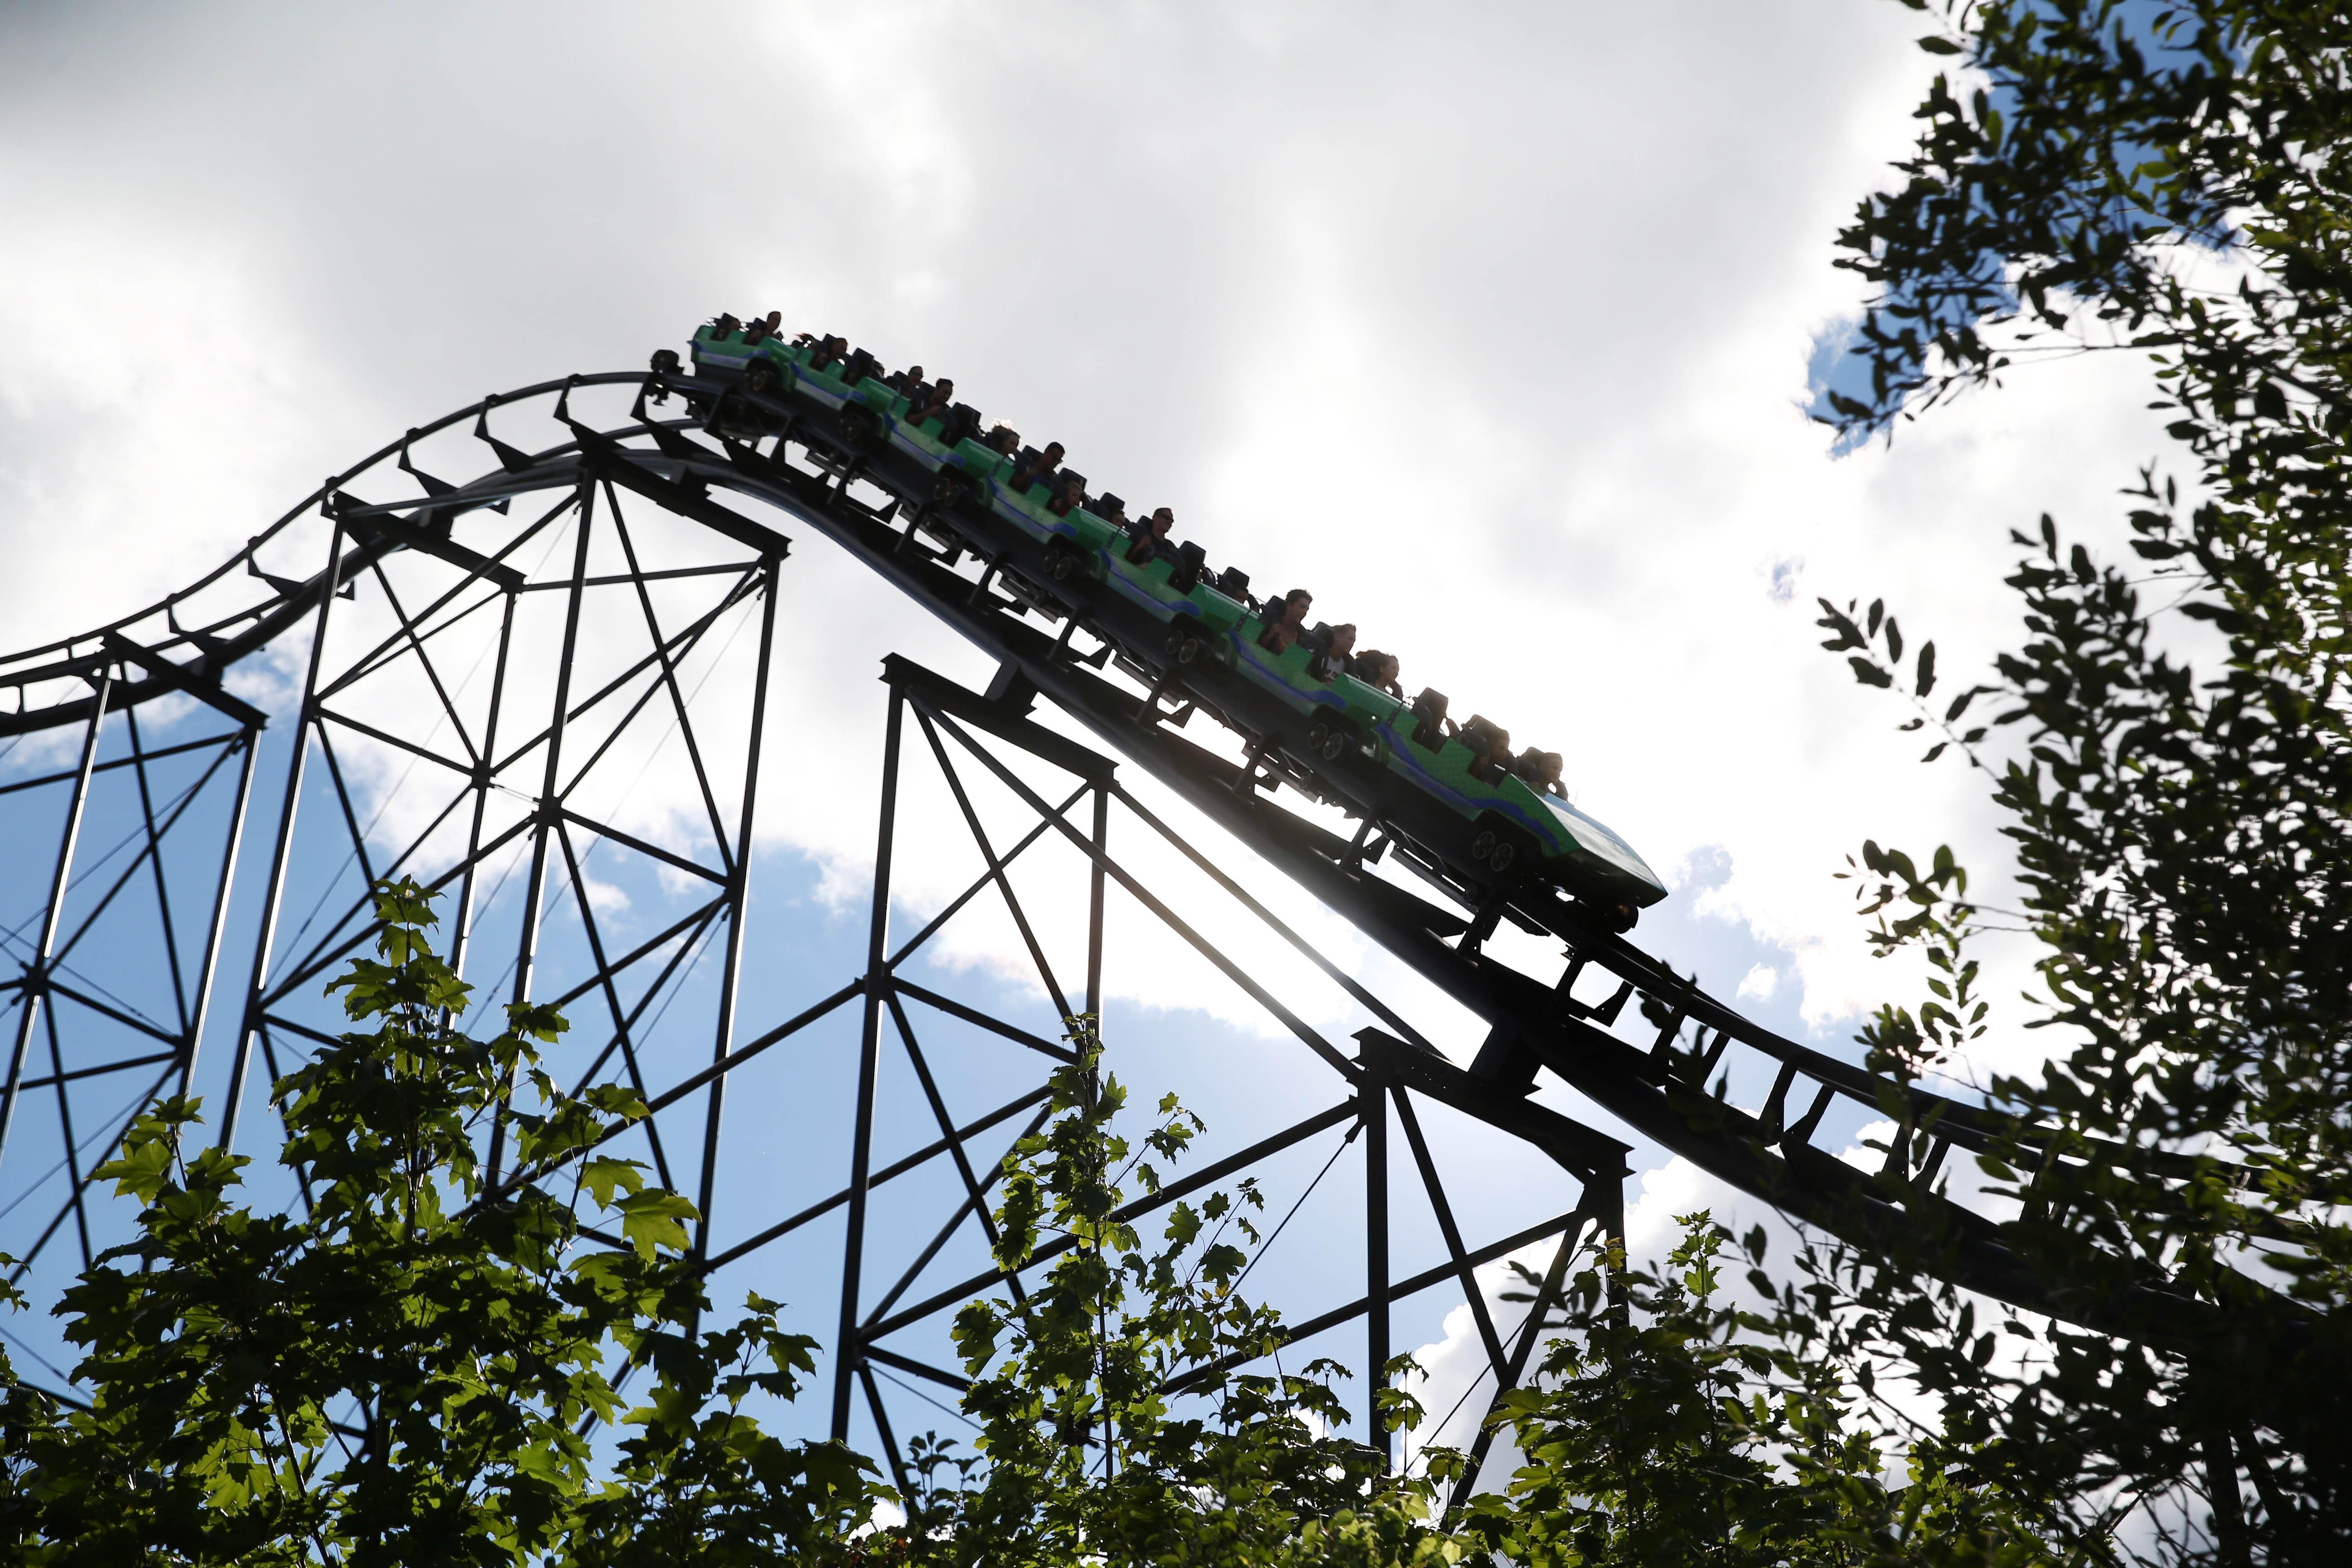 The Viper roller coaster is one of the signature rides at Darien Lake.  (Sharon Cantillon/Buffalo News)